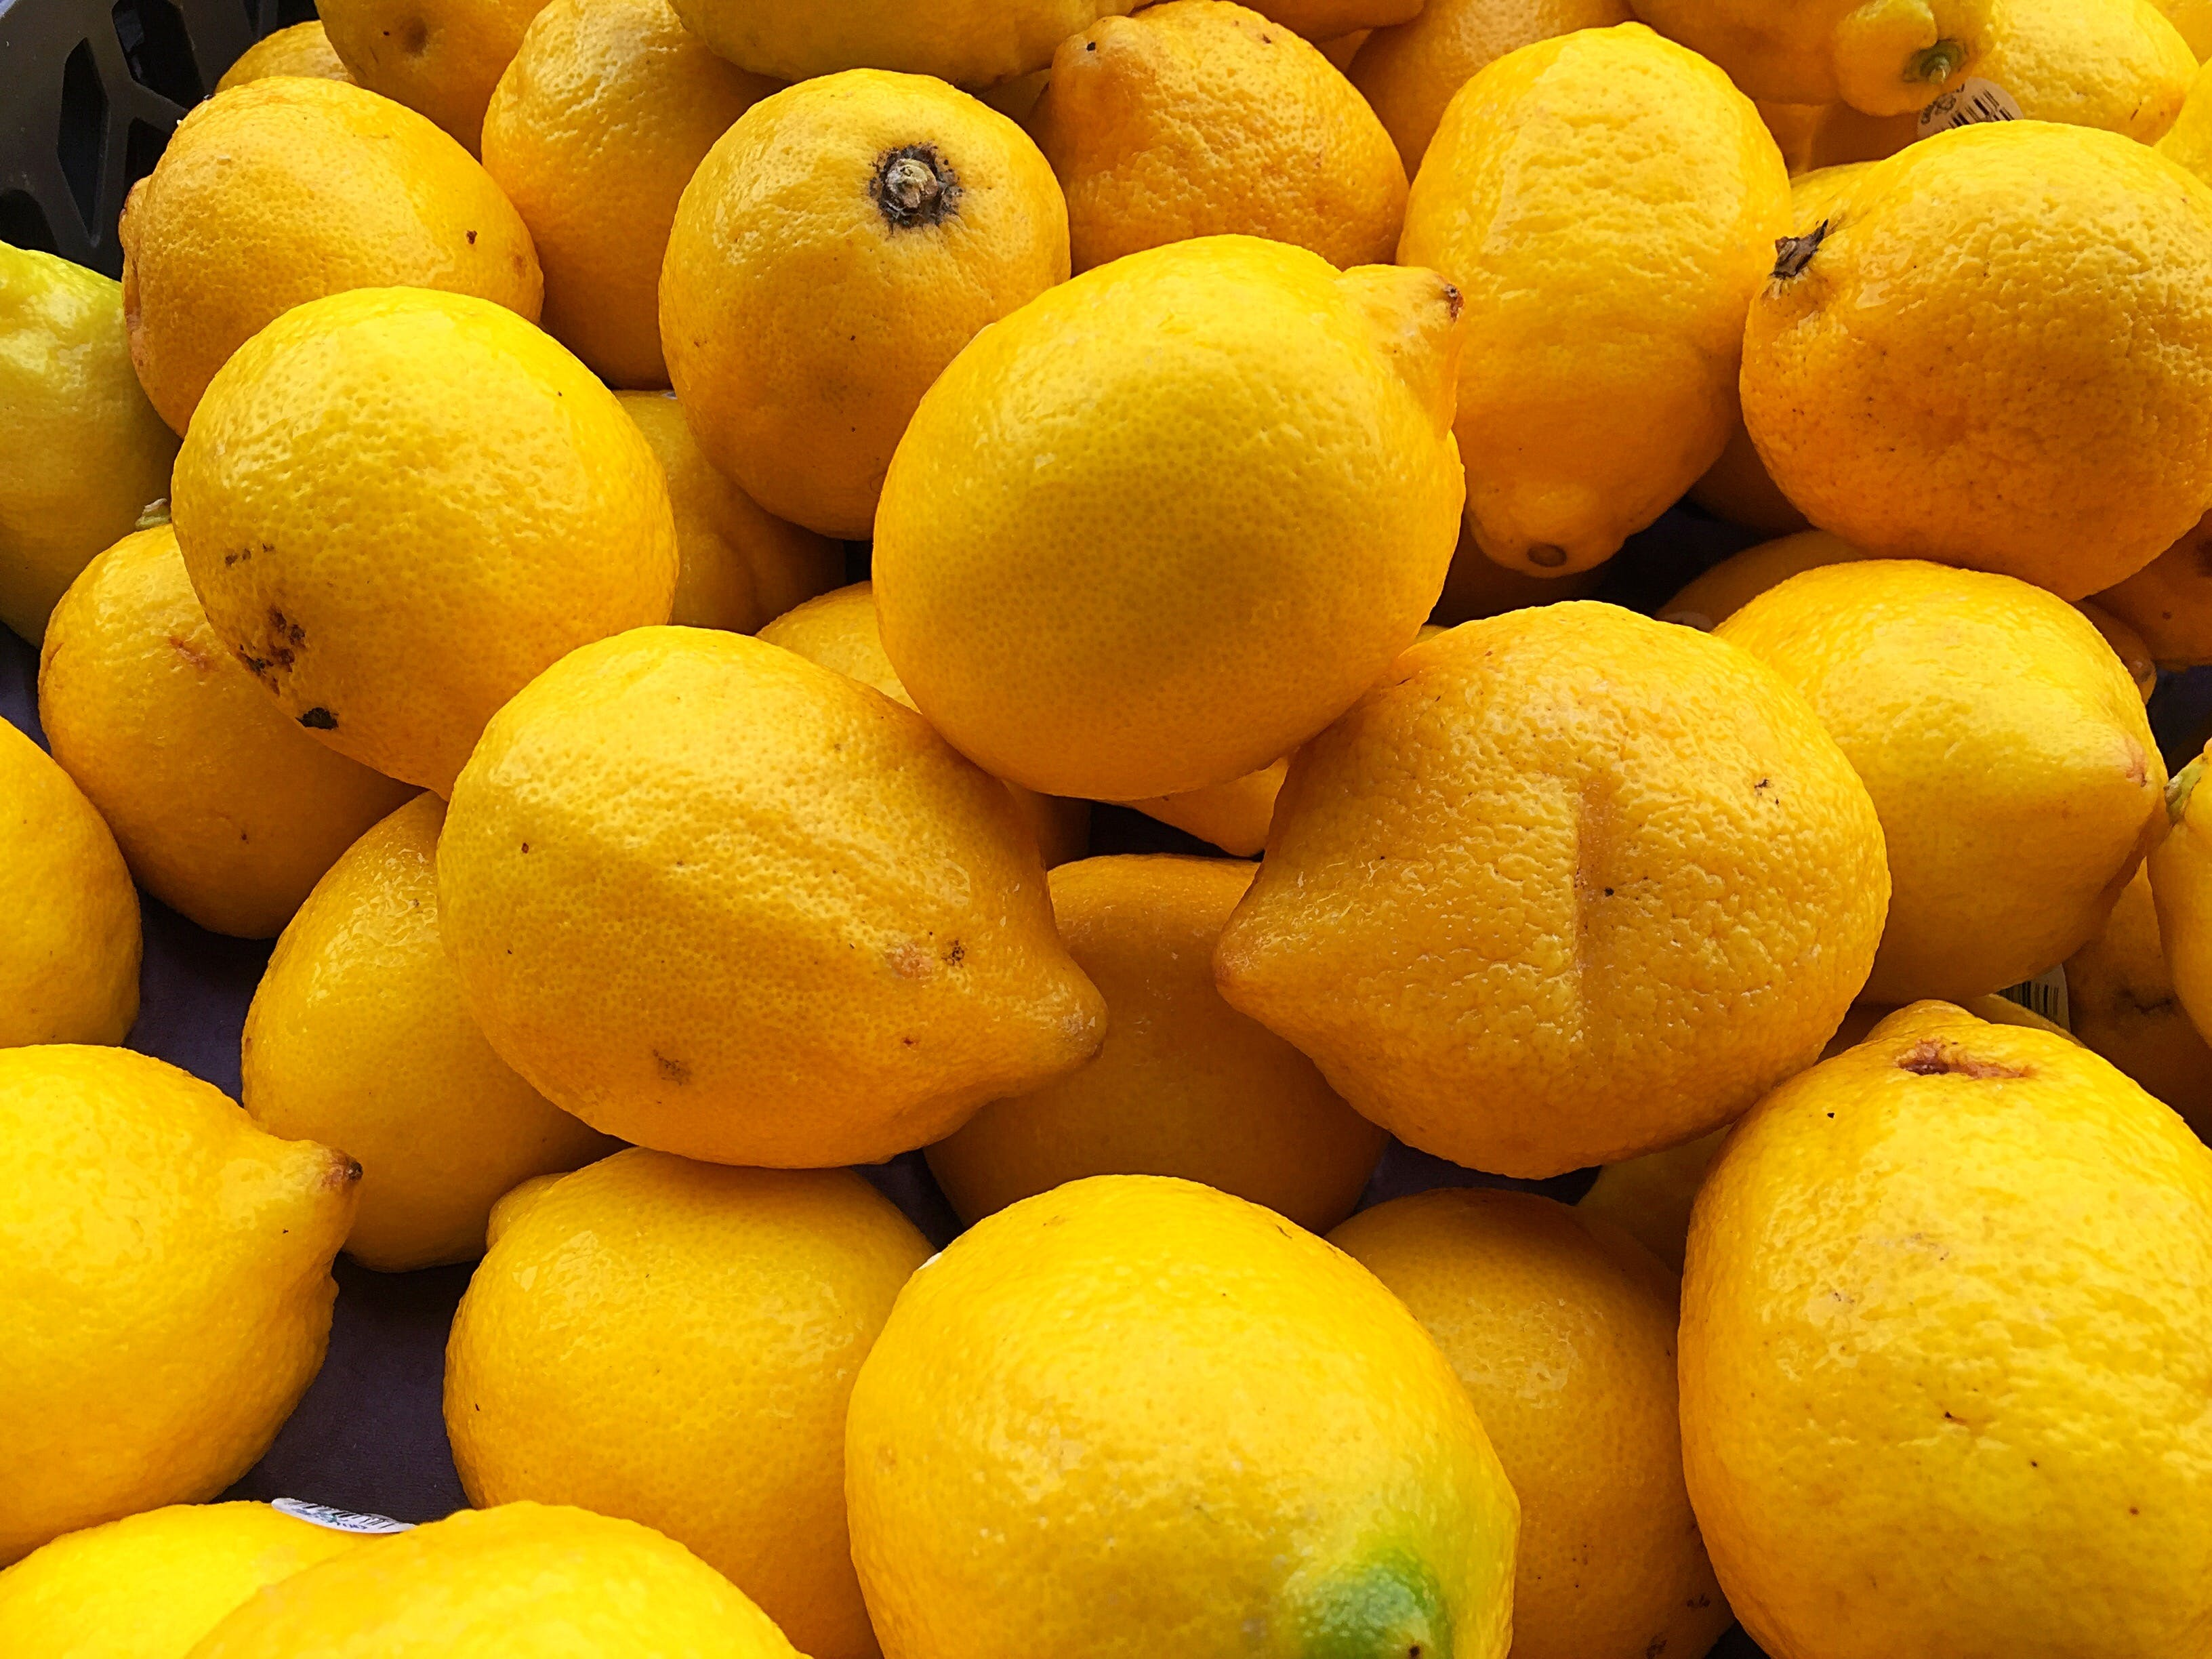 Free stock photo of yellow, lemons, citrus fruit